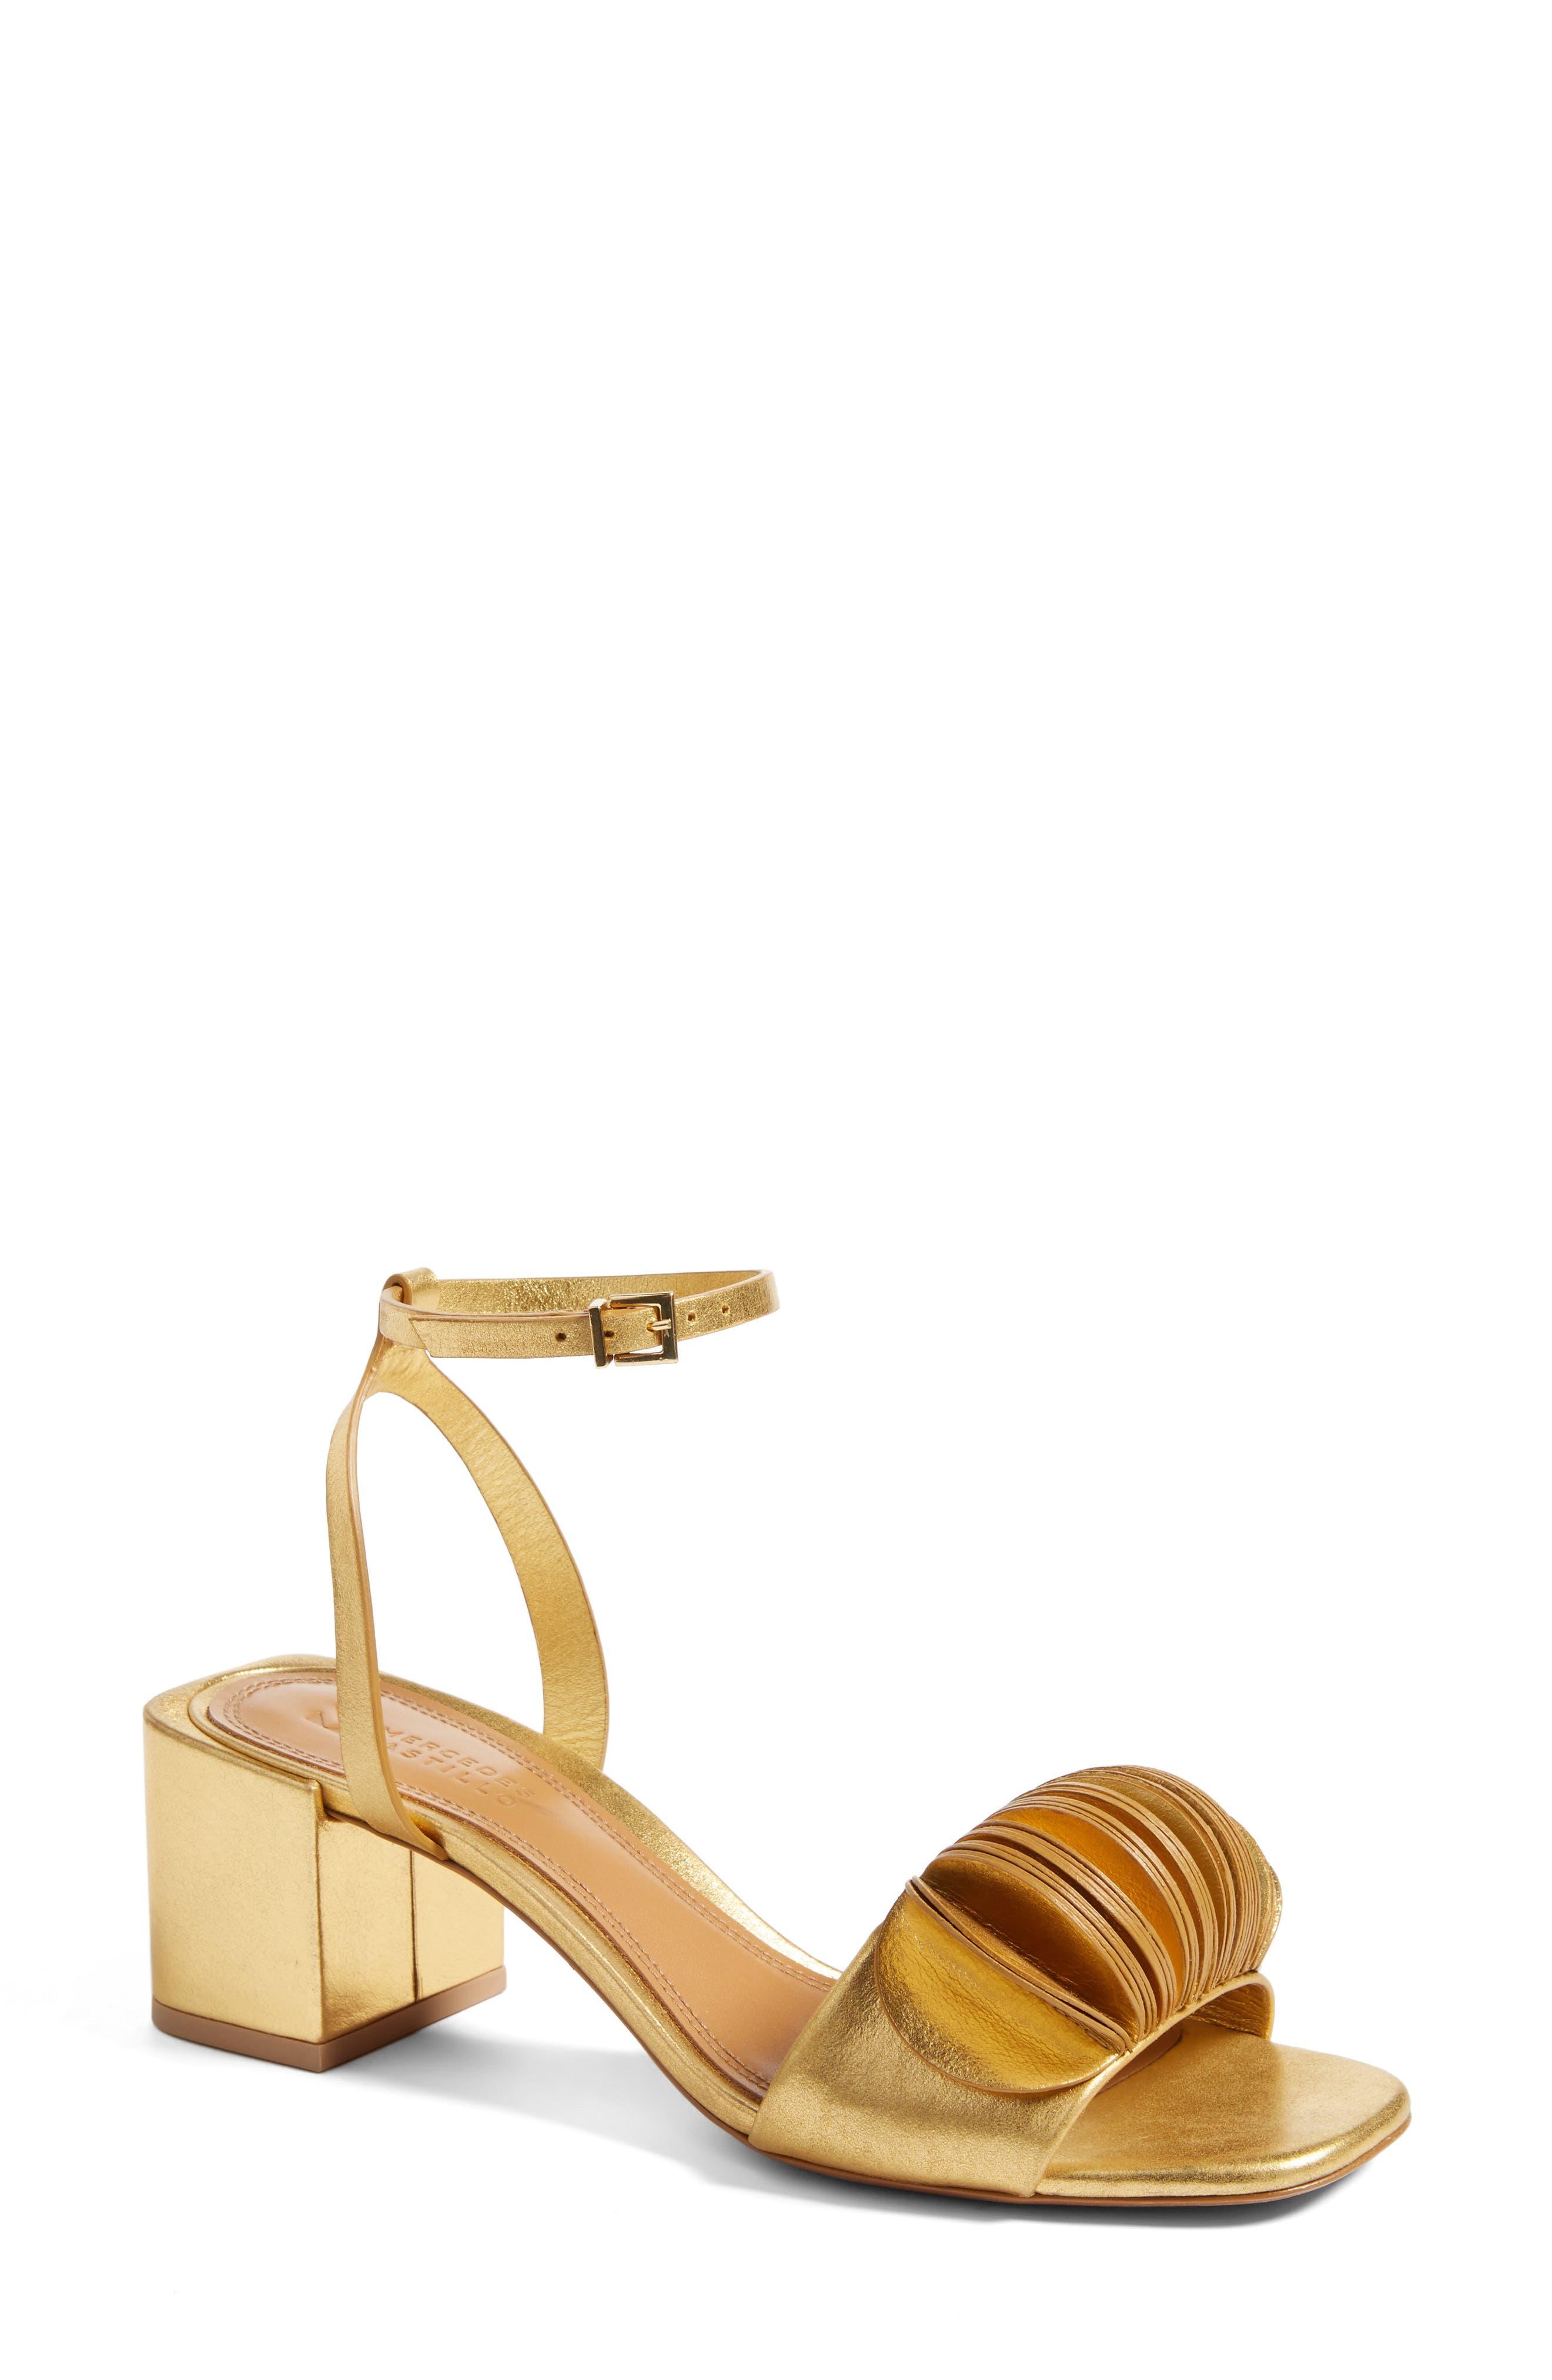 Alternate Image 1 Selected - Mercedes Castillo Riza Block Heel Sandal (Women)